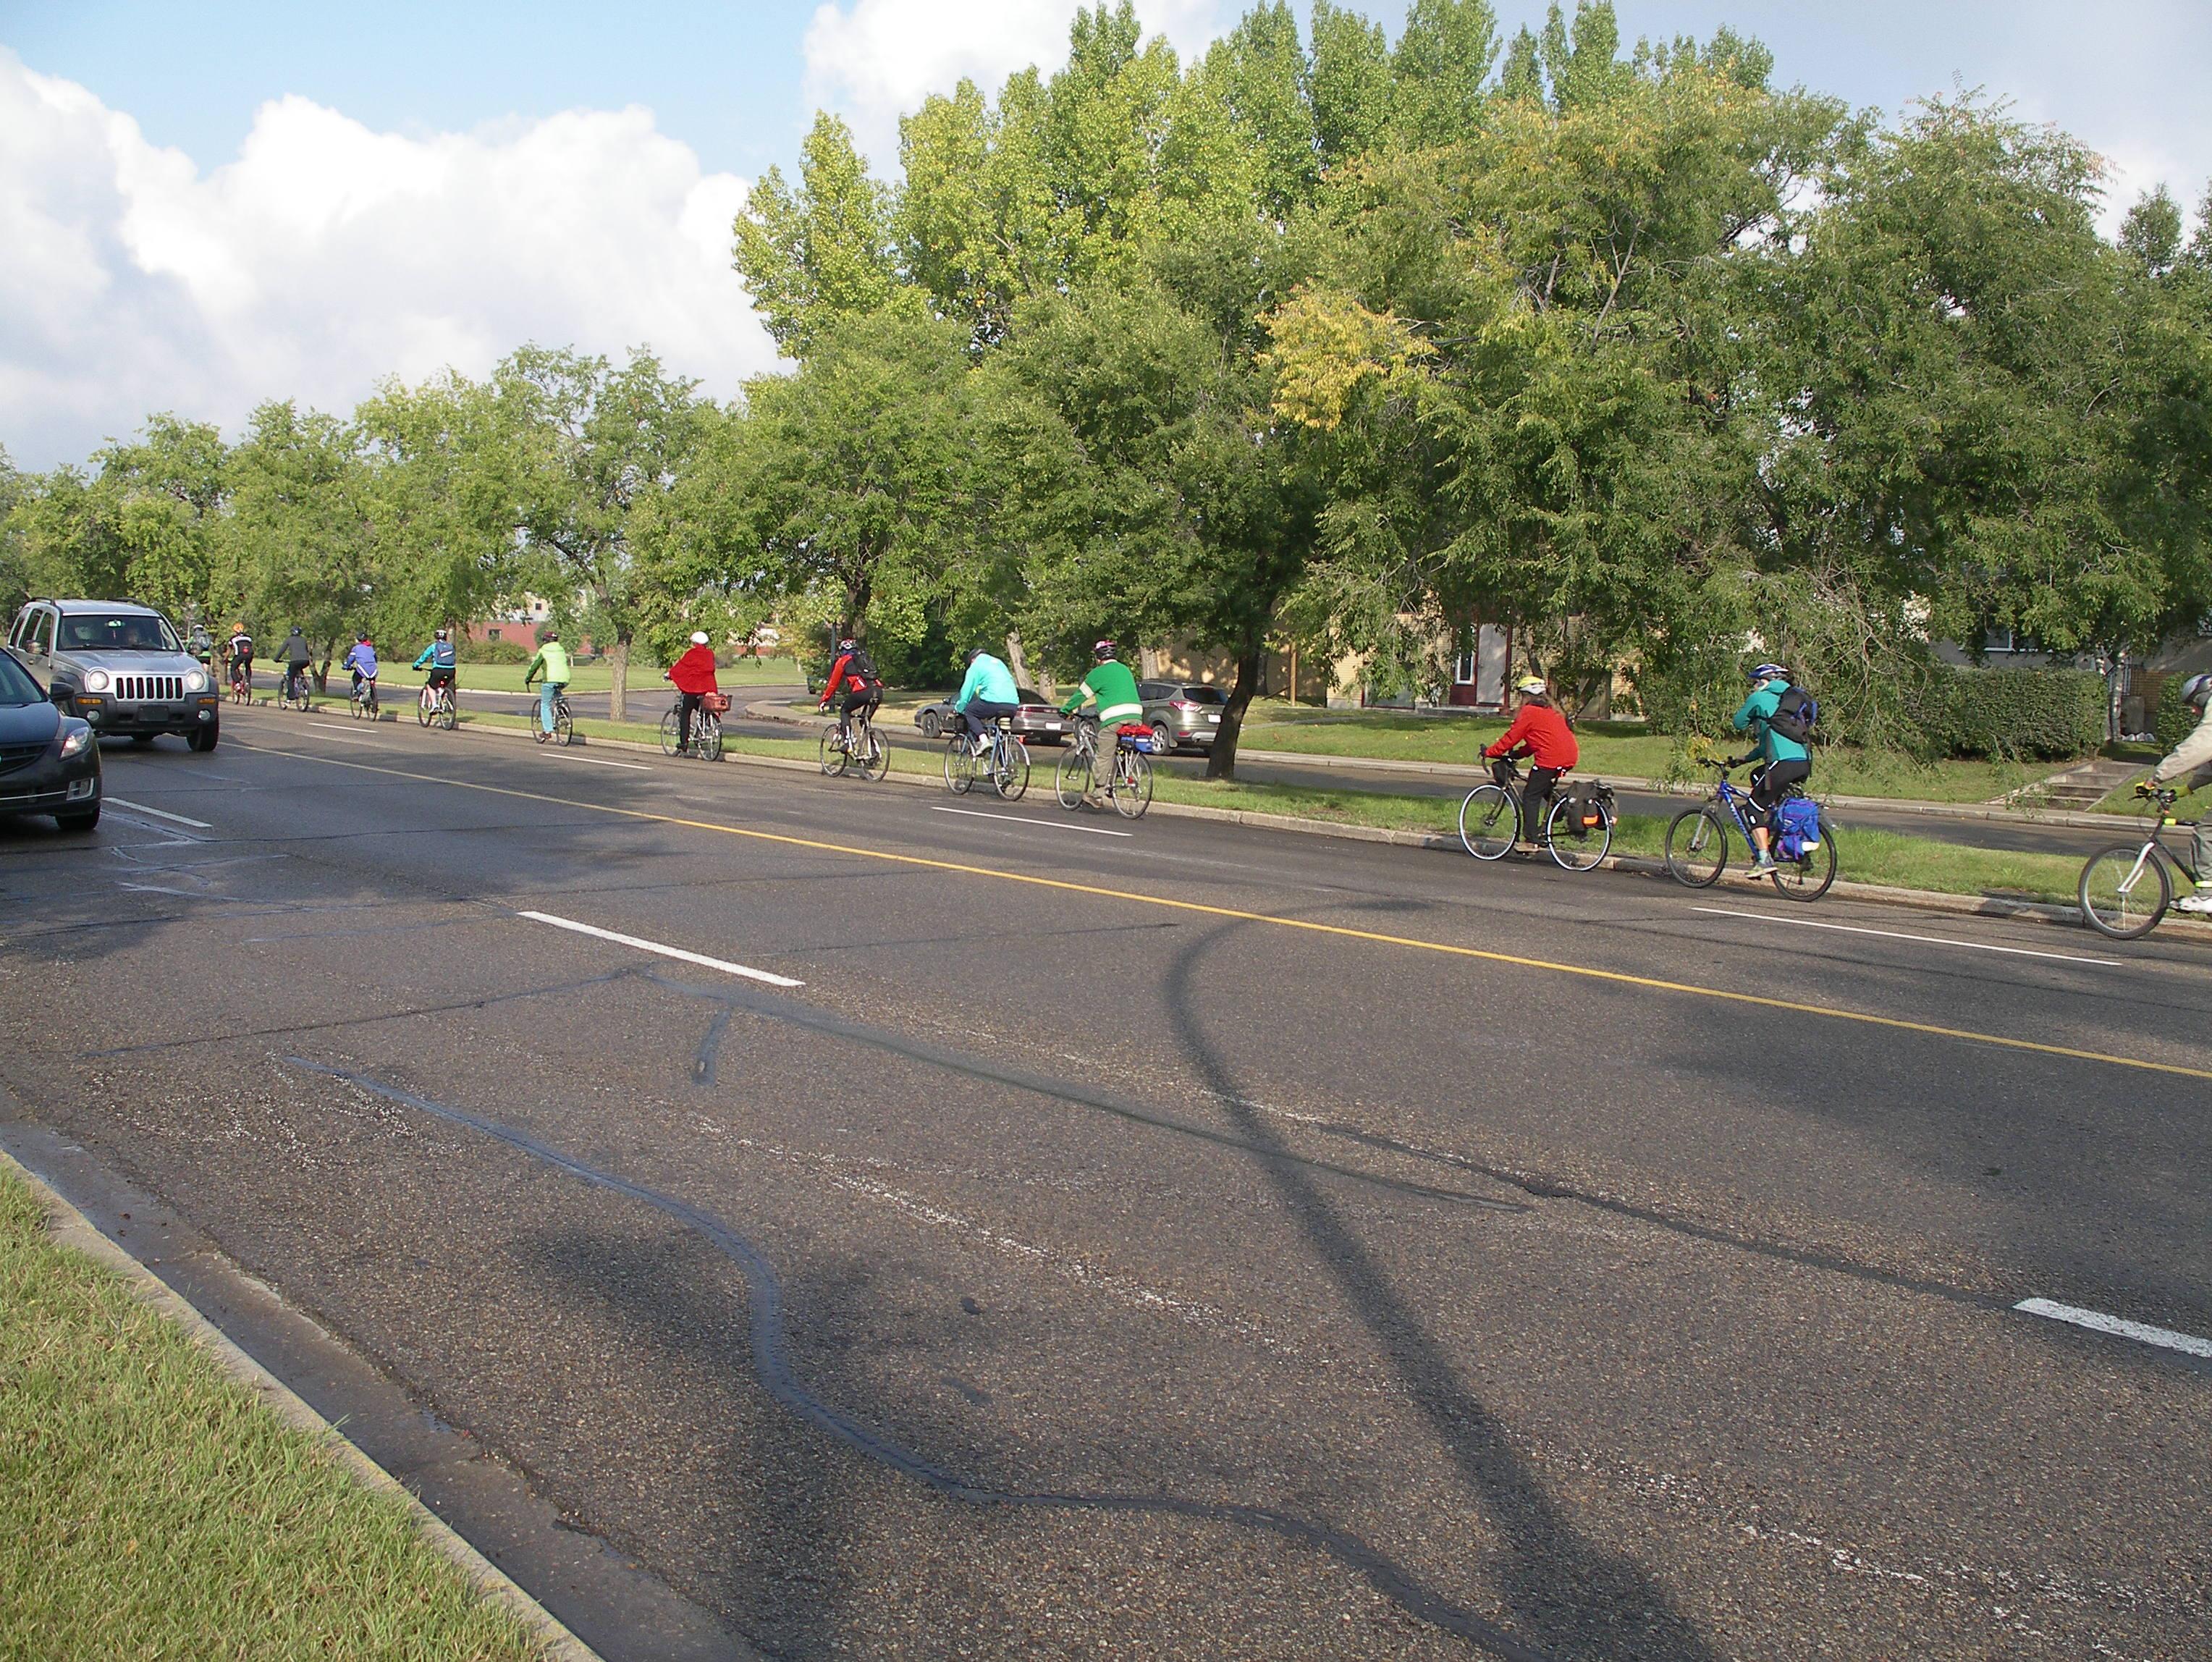 5th Annual Bike Parade/Ride